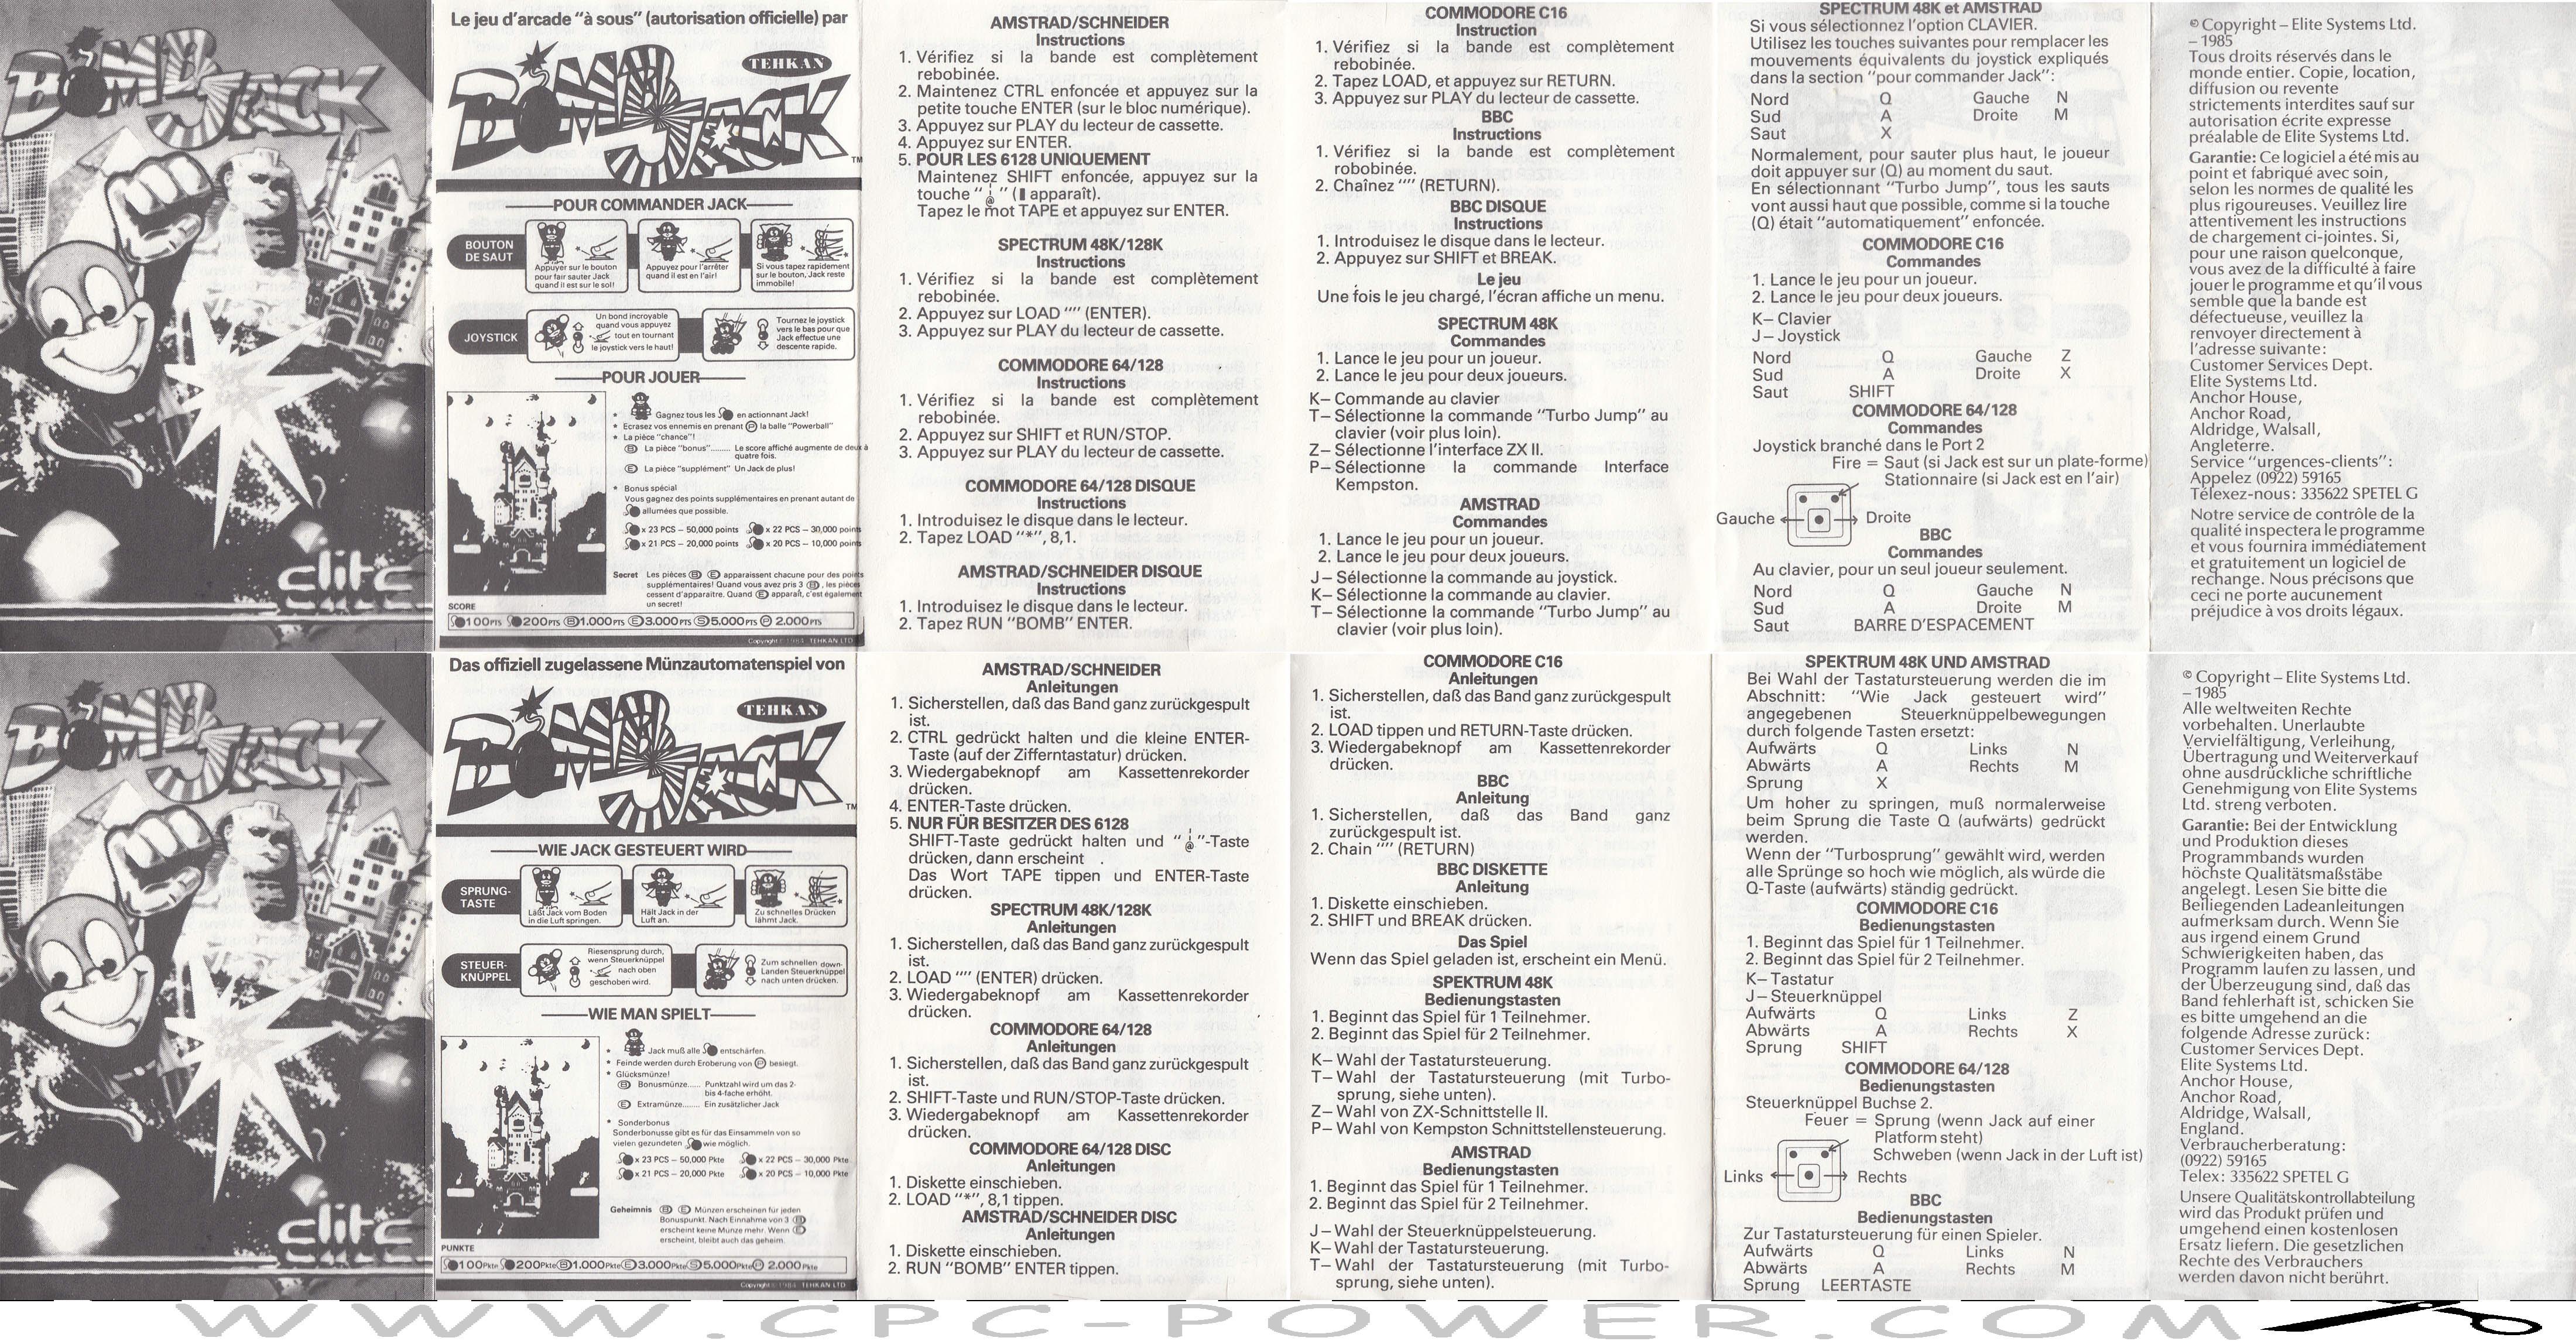 Bomb Jack Elite Systems 1986